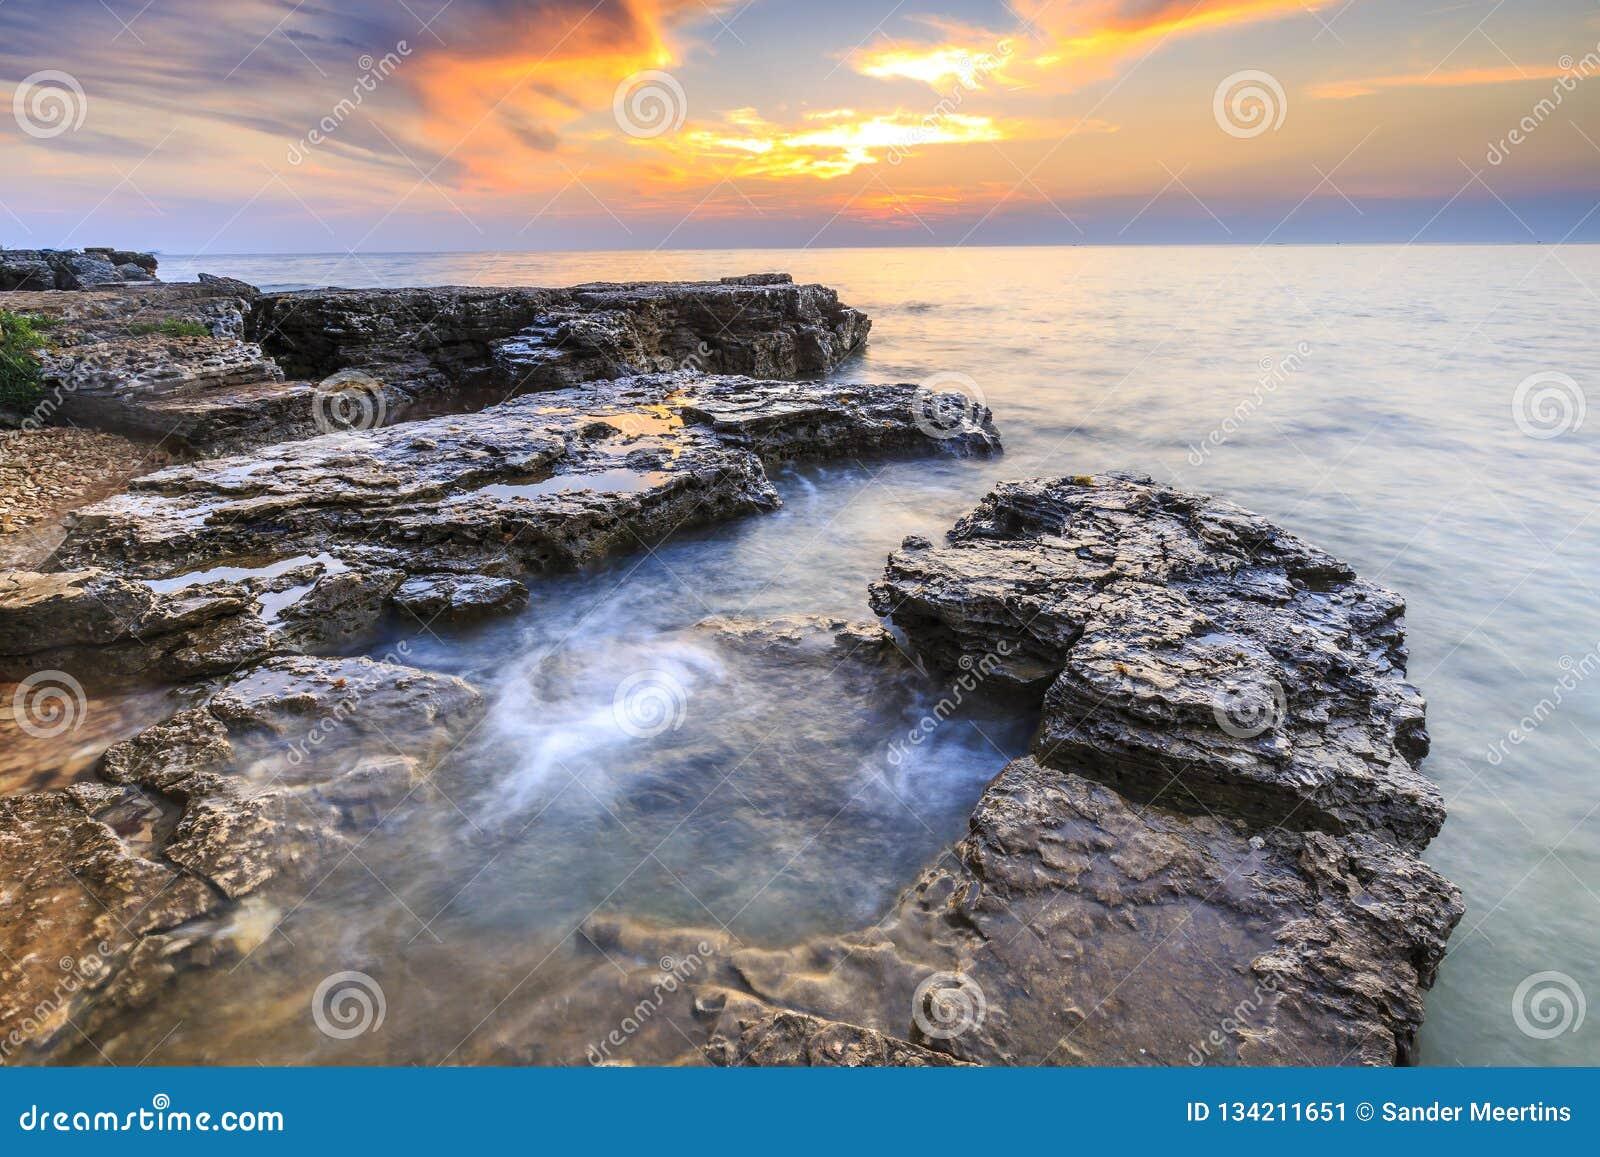 Enjoying the colorful sunset on a beach with rocks on the Adriatic Sea coast Istria Croatia